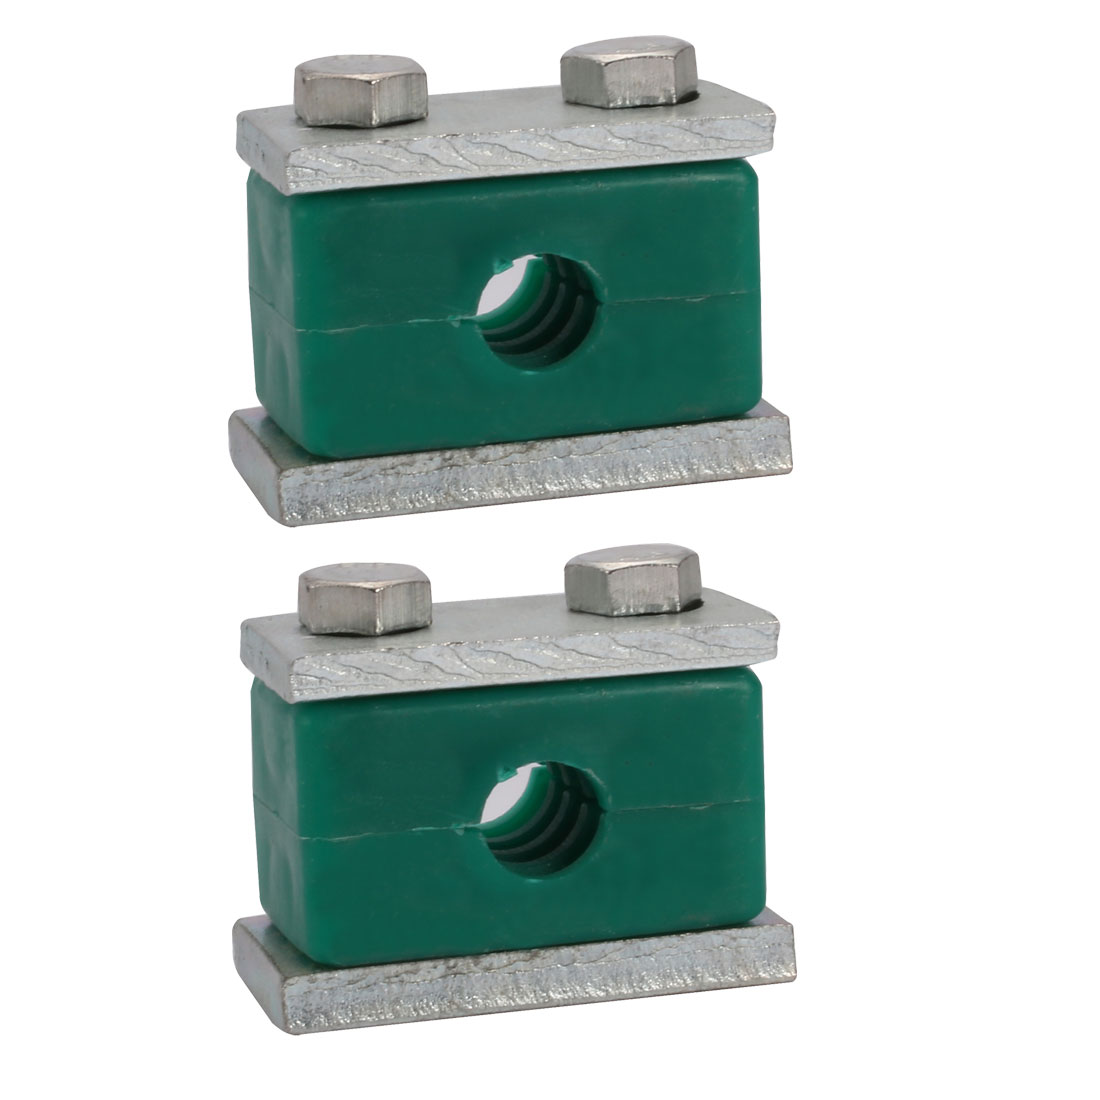 14mm Fitting Dia Polypropylene Aluminum Heavy Series Hose Pipe Tube Clamp 2pcs